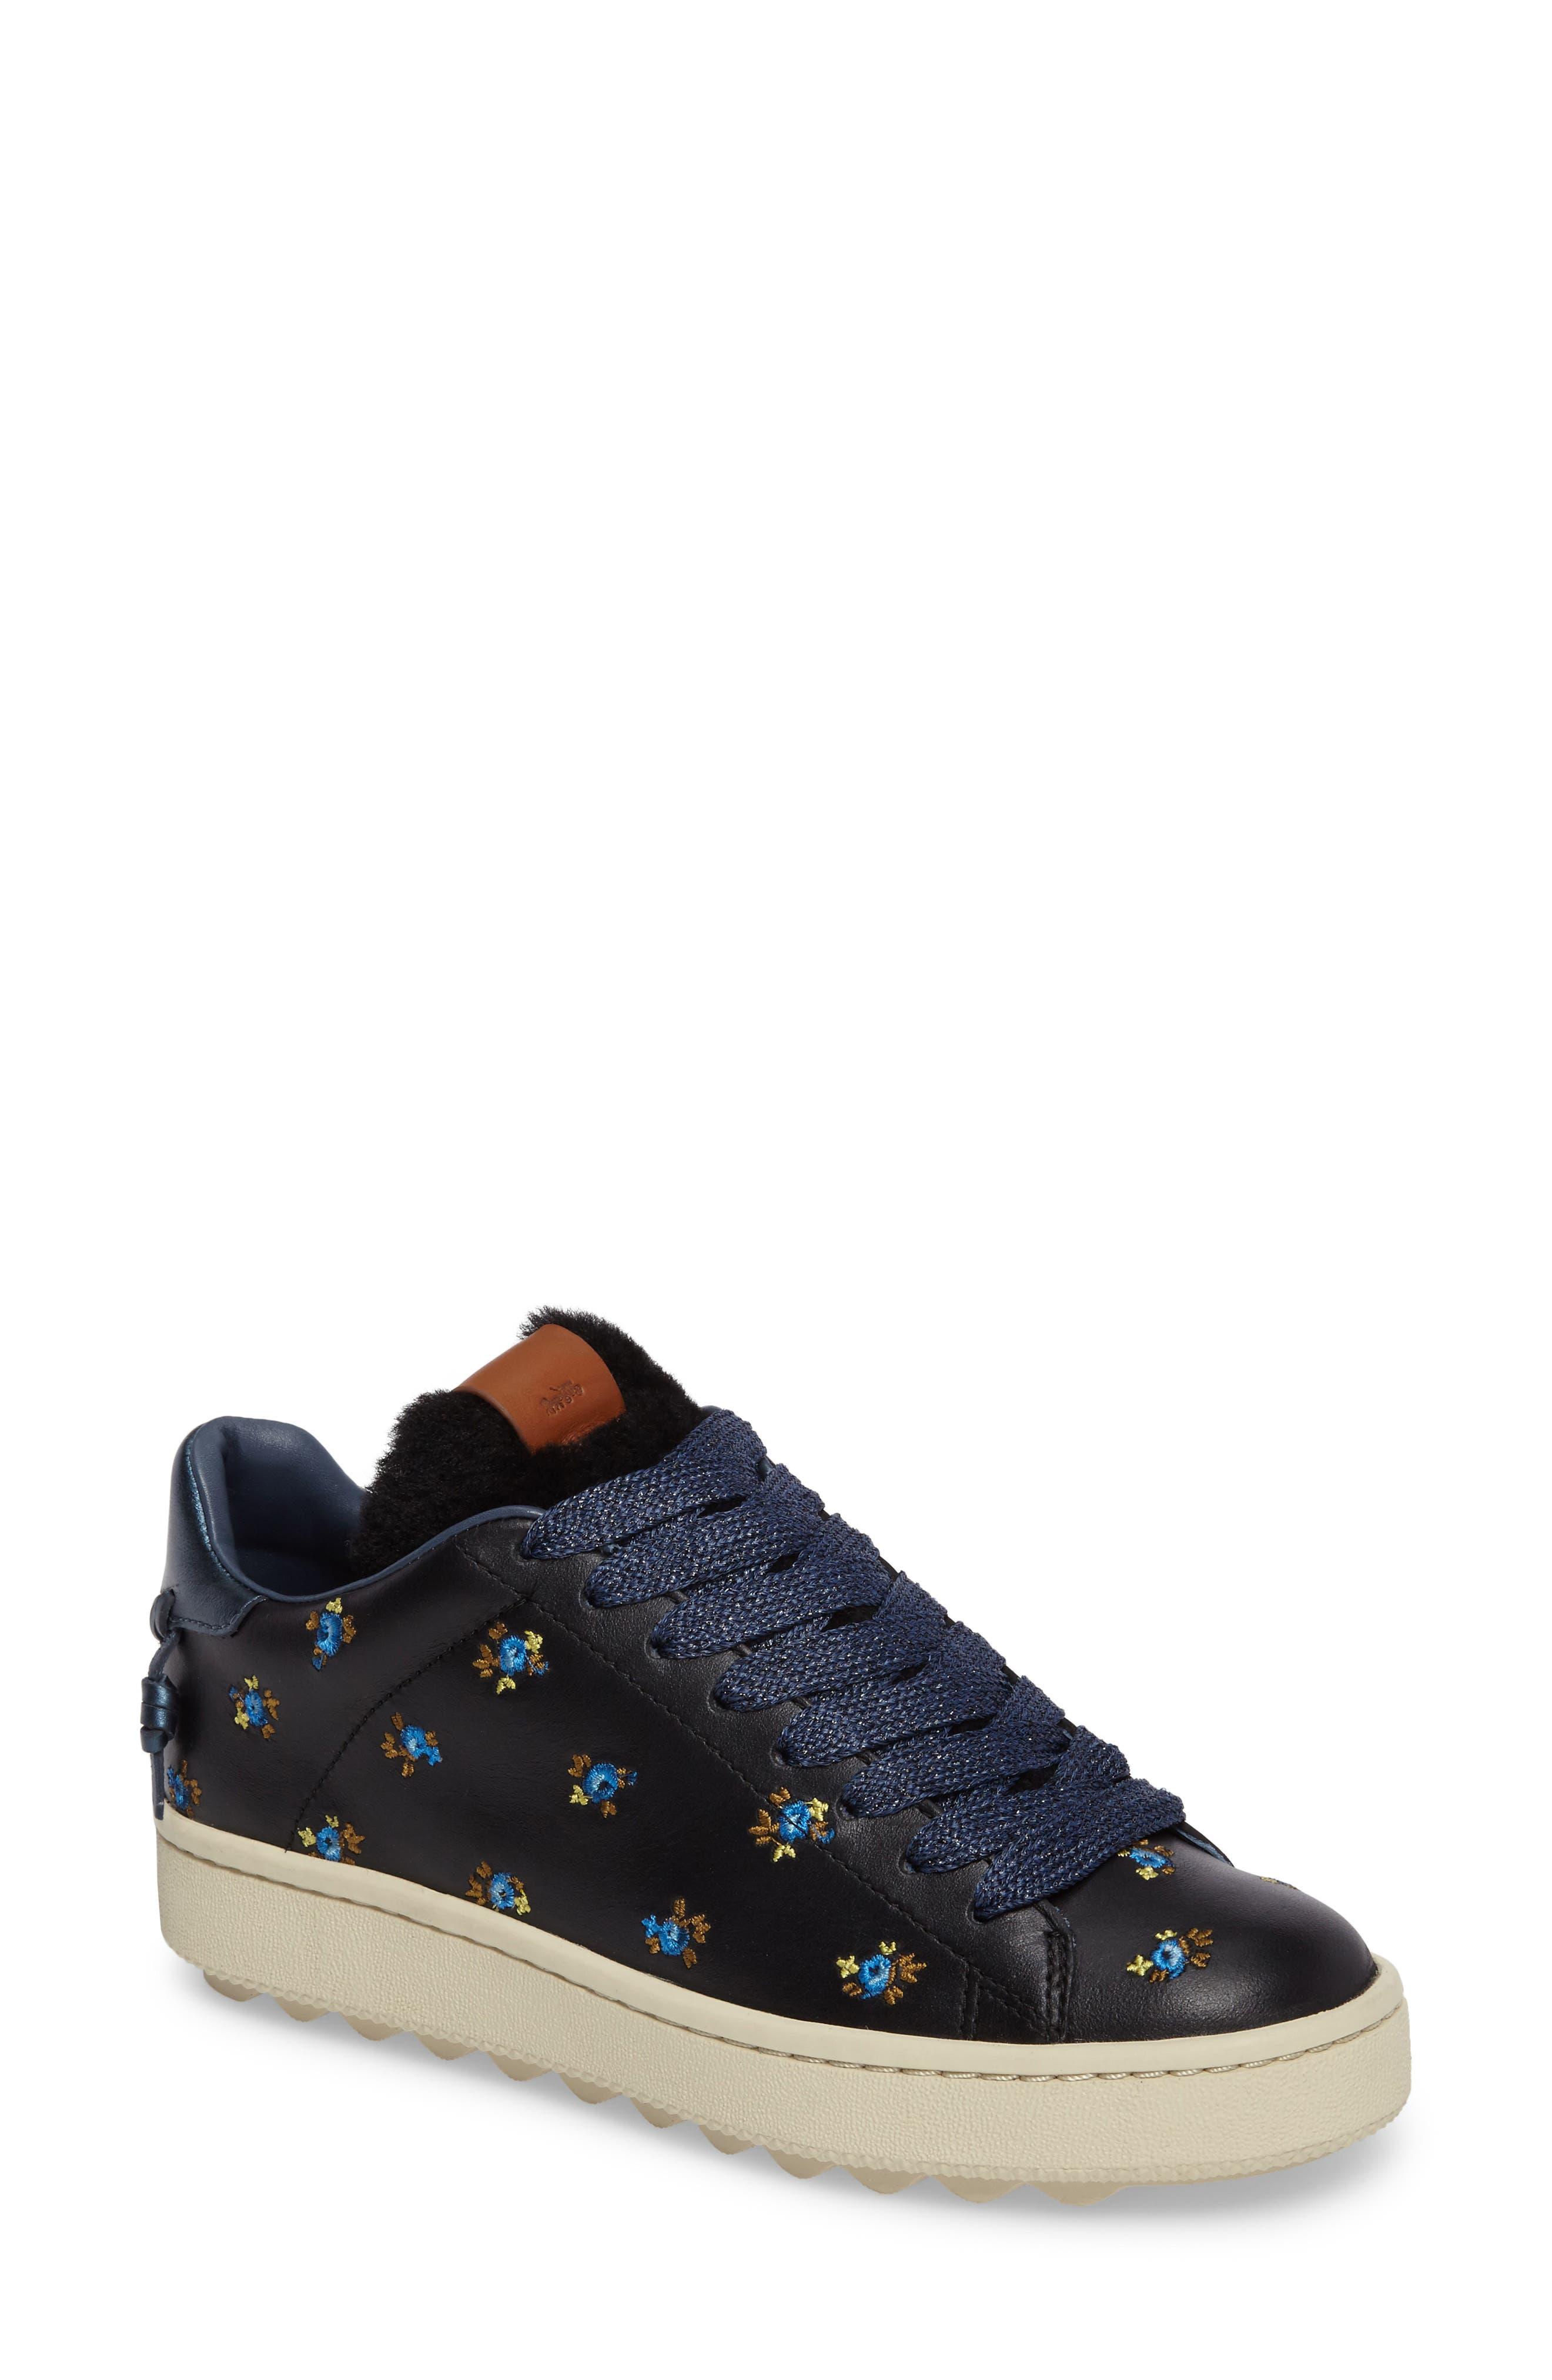 COACH Prairie Embroidered Sneaker (Women)